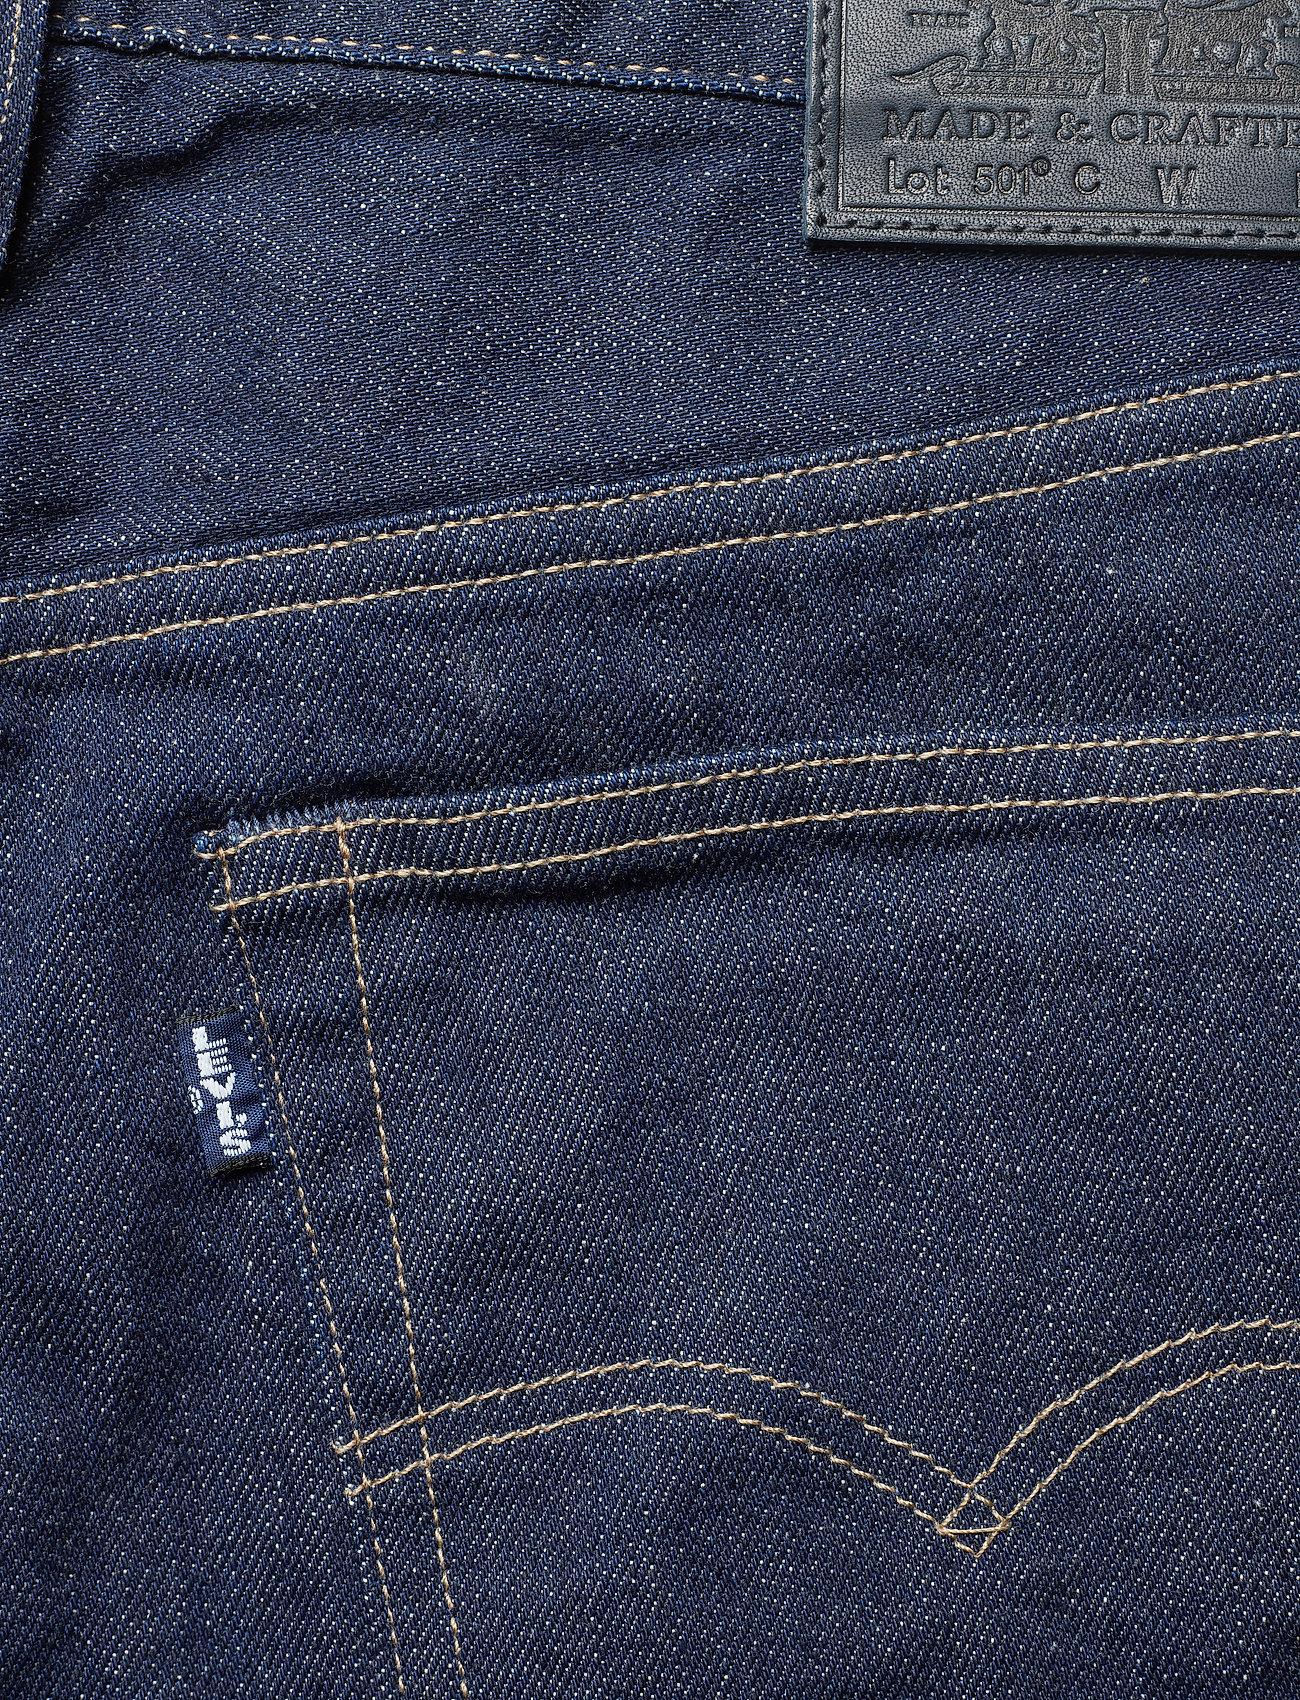 Levi's Made & Crafted - 501 CROP LMC RAW INDIGO - straight regular - dark indigo - flat finish - 4